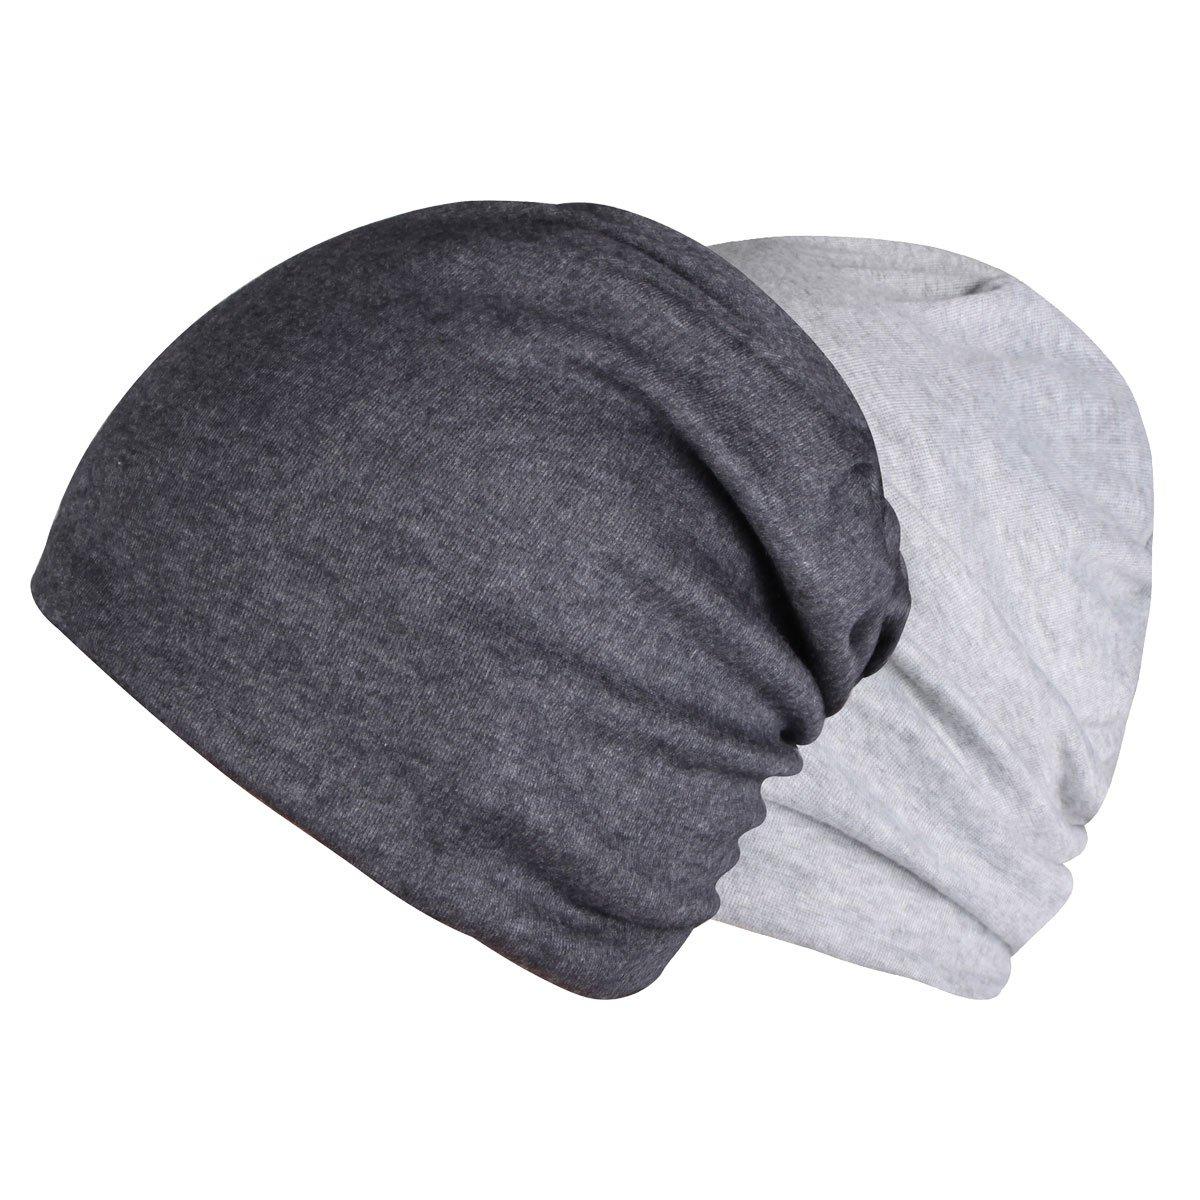 Timol 2 Pack Grey Beanie Chemo Caps for Women Men Cancer Headwear Summer Hat(Dark Gray and Light Gray)